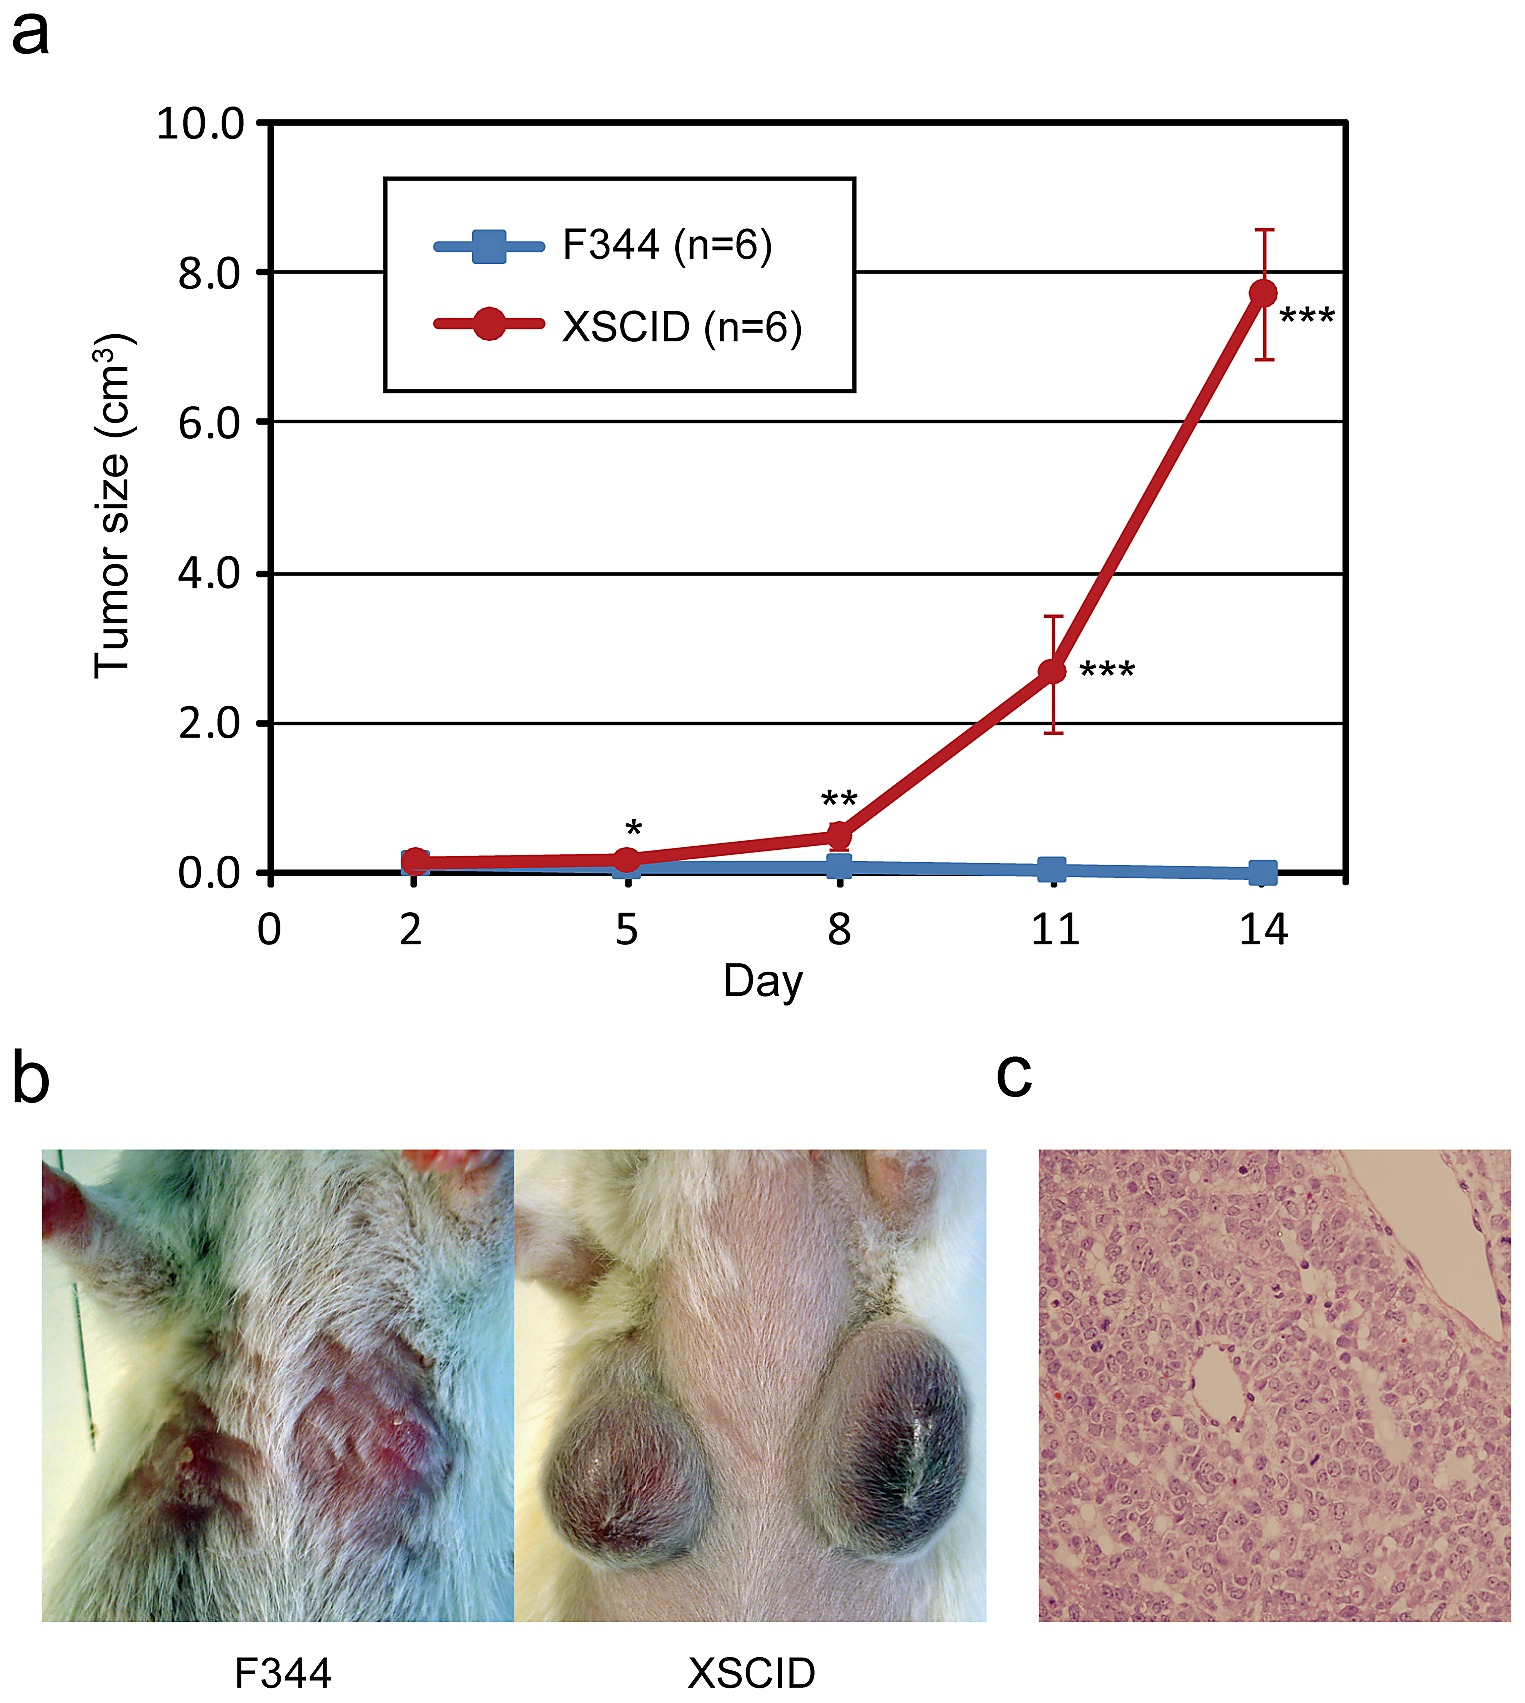 ovarian cancer xenotransplants caracteristicas del papiloma humano en hombres